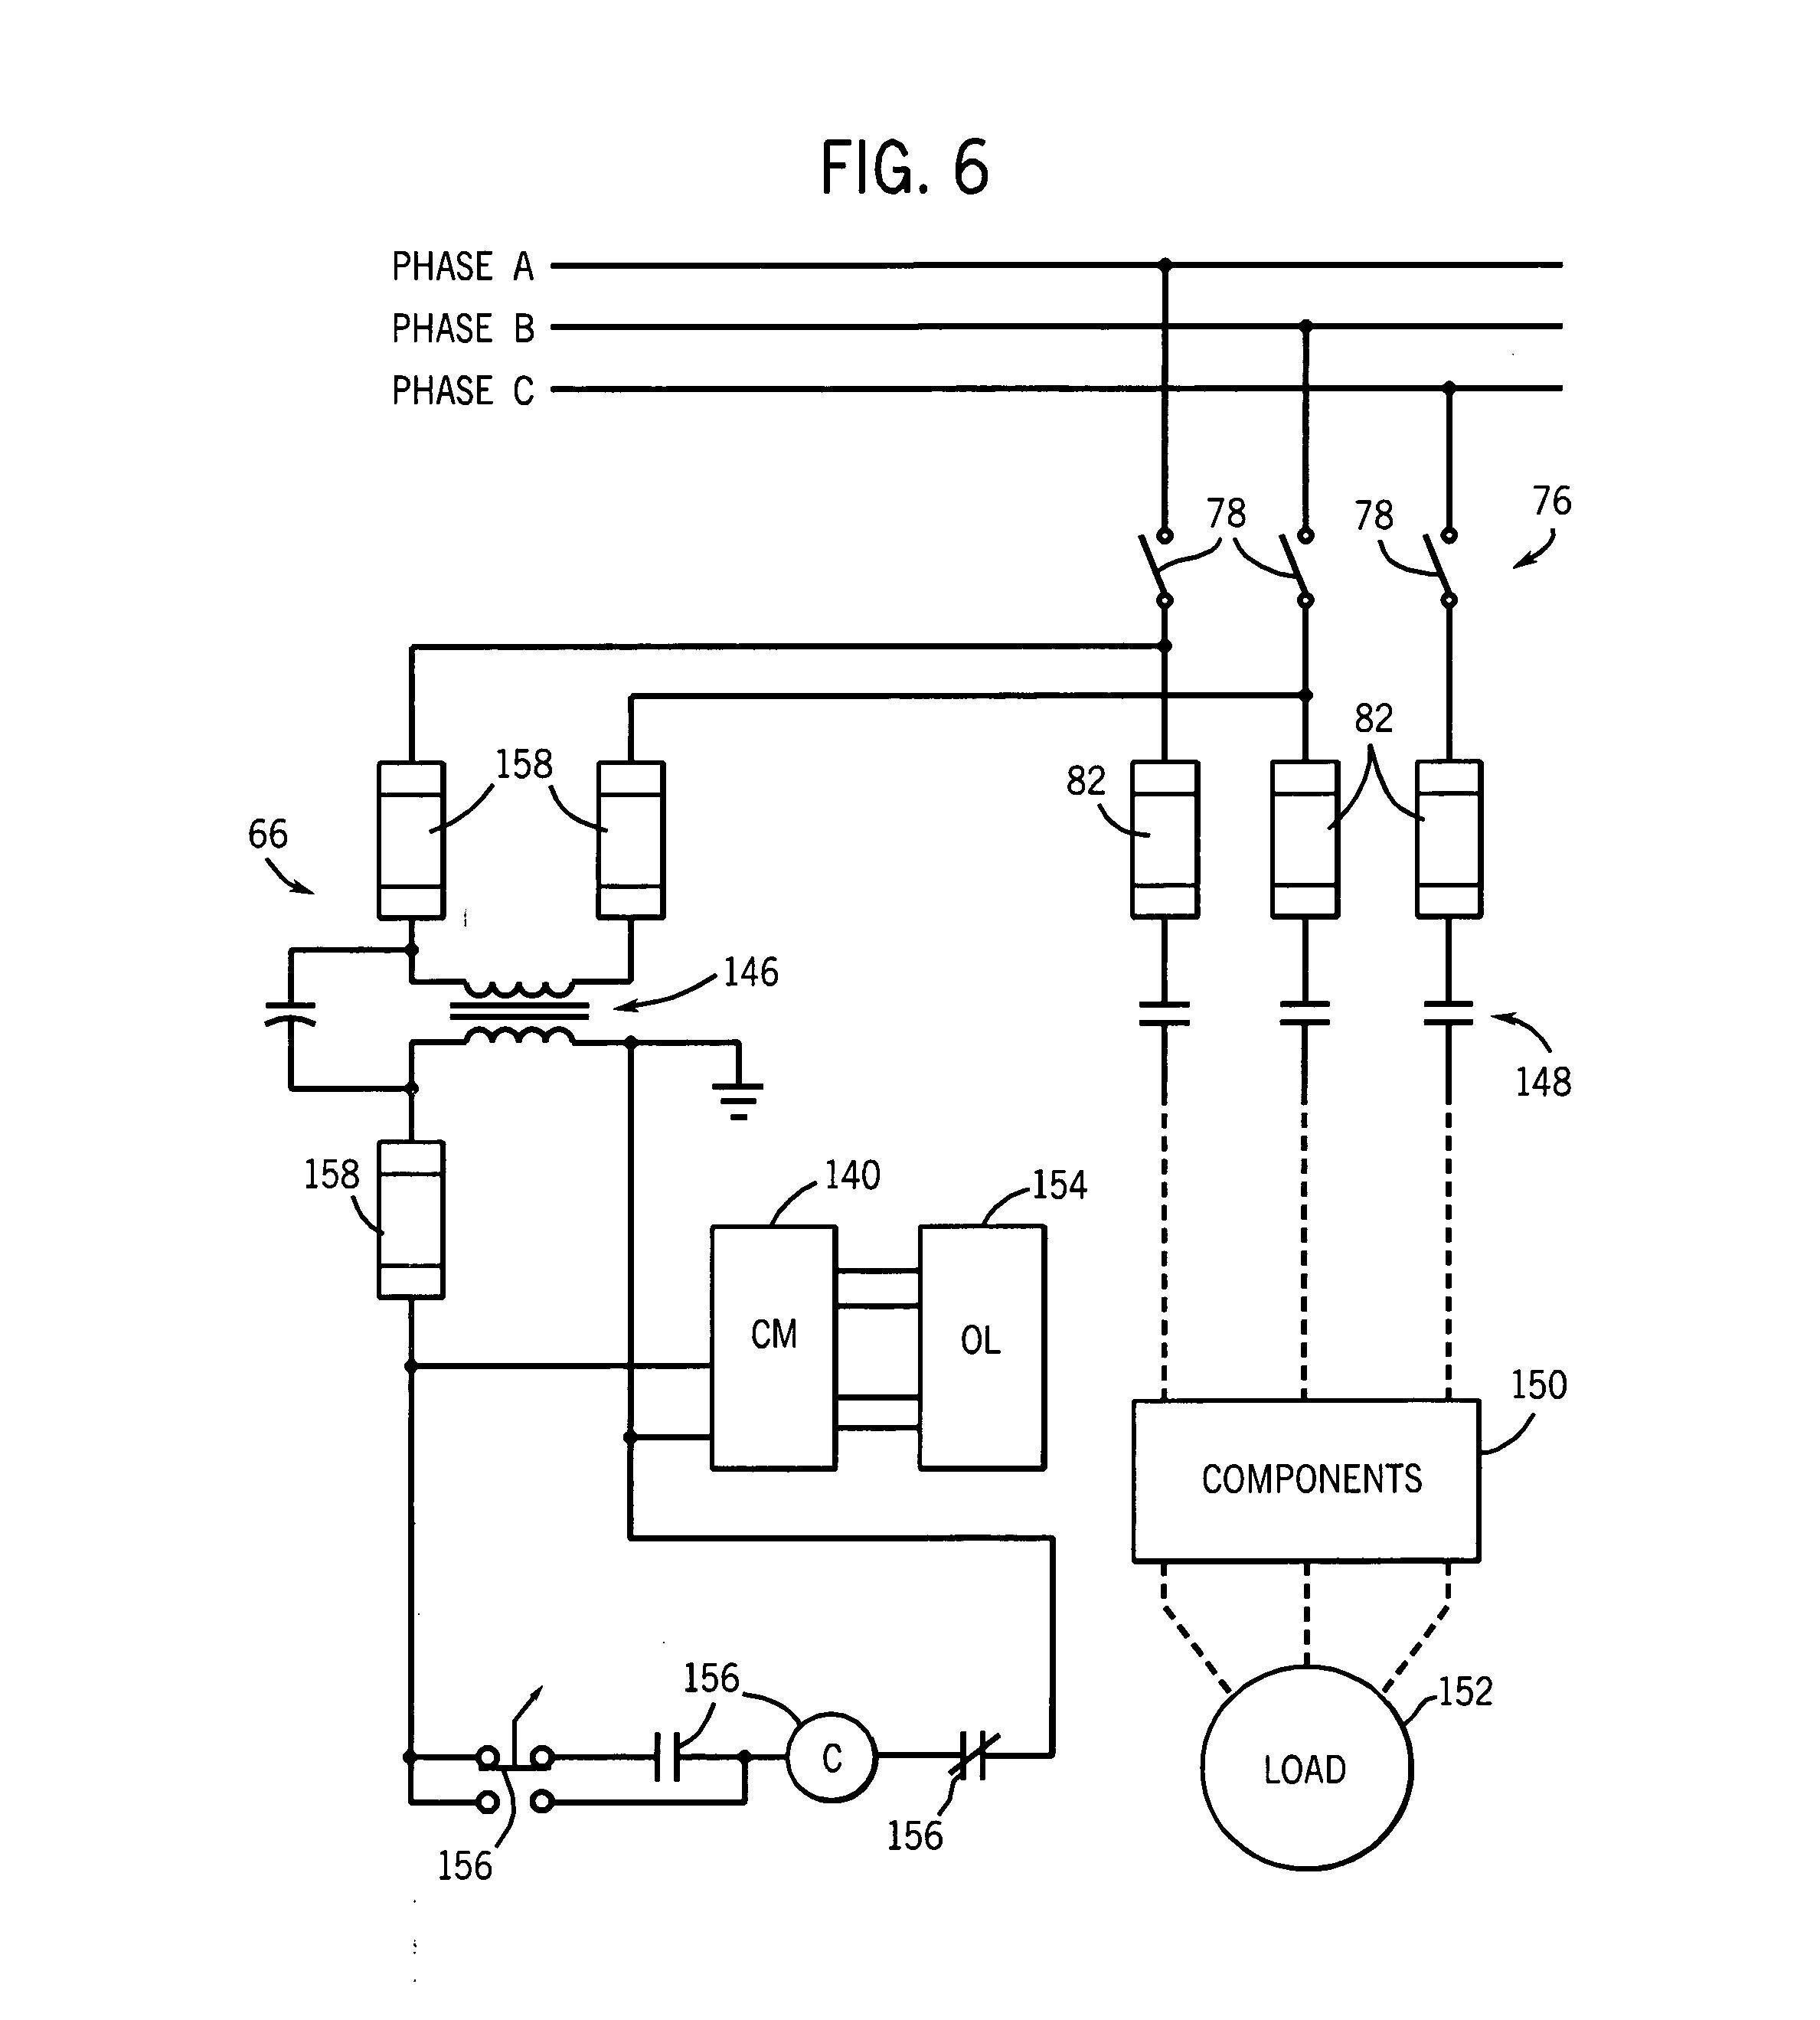 allen bradley 855t wiring diagram - allen bradley motor starter wiring  diagram and control diagrams fine